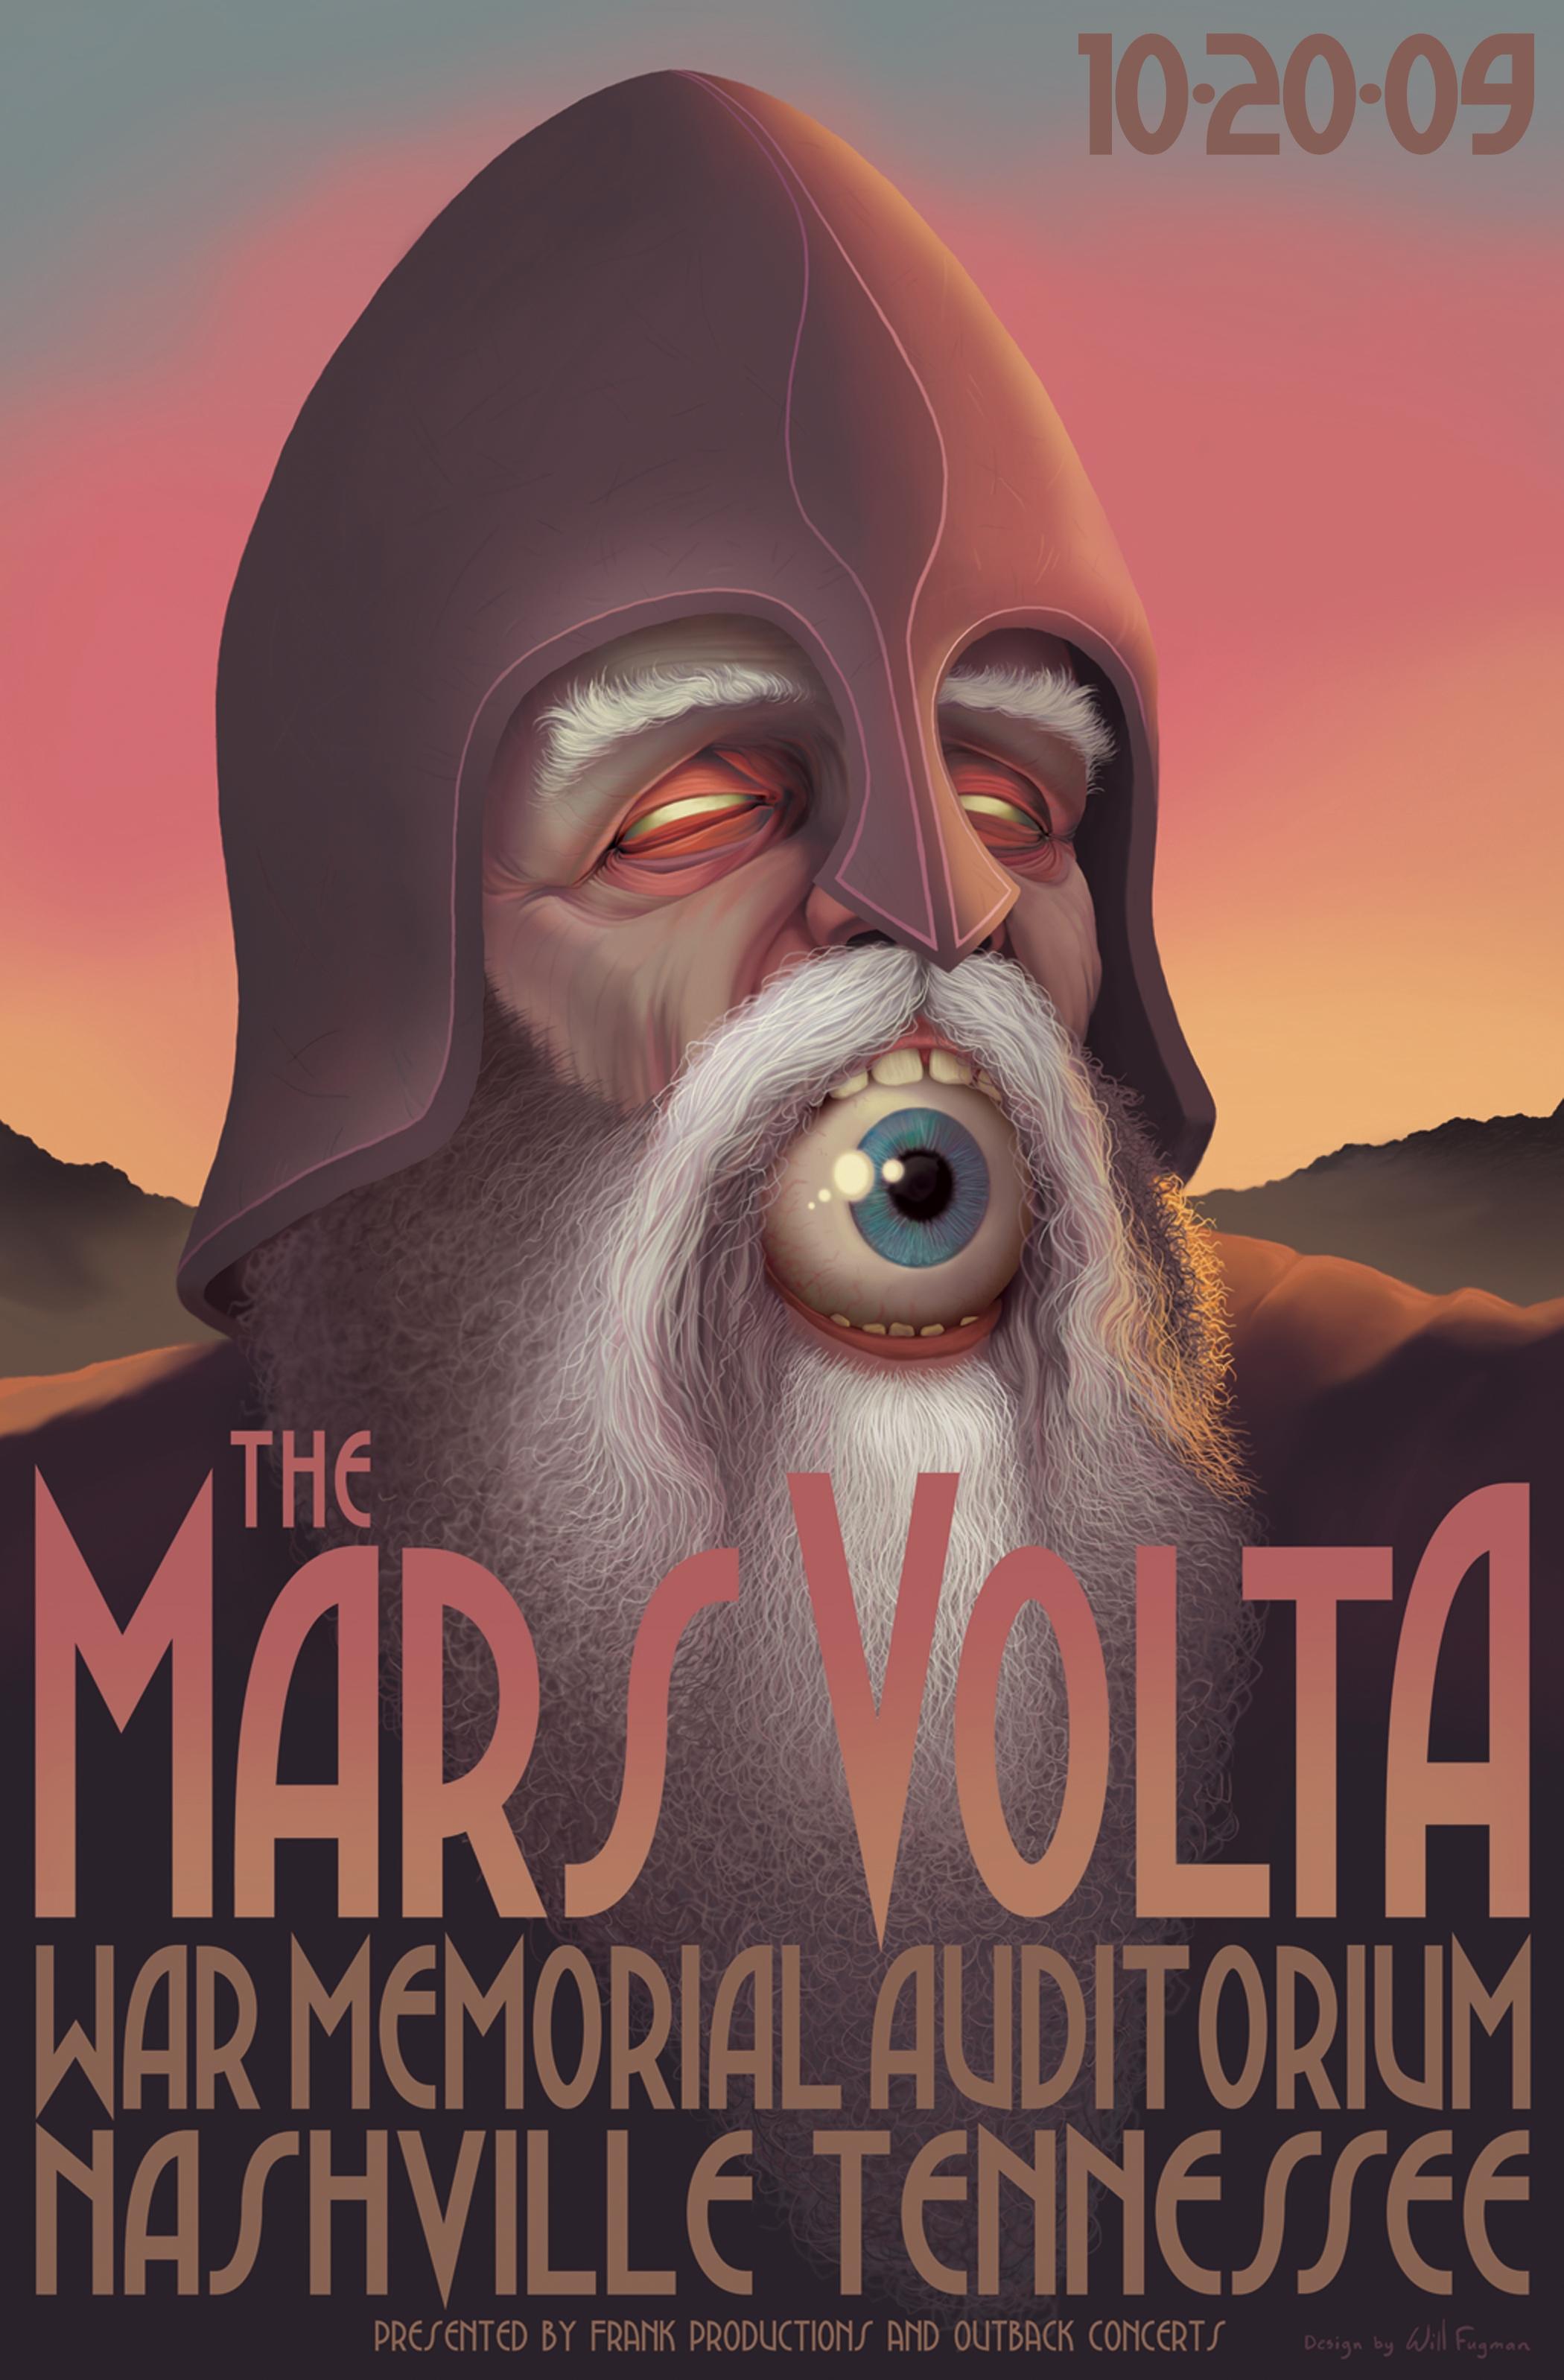 Mars Volta - 2009